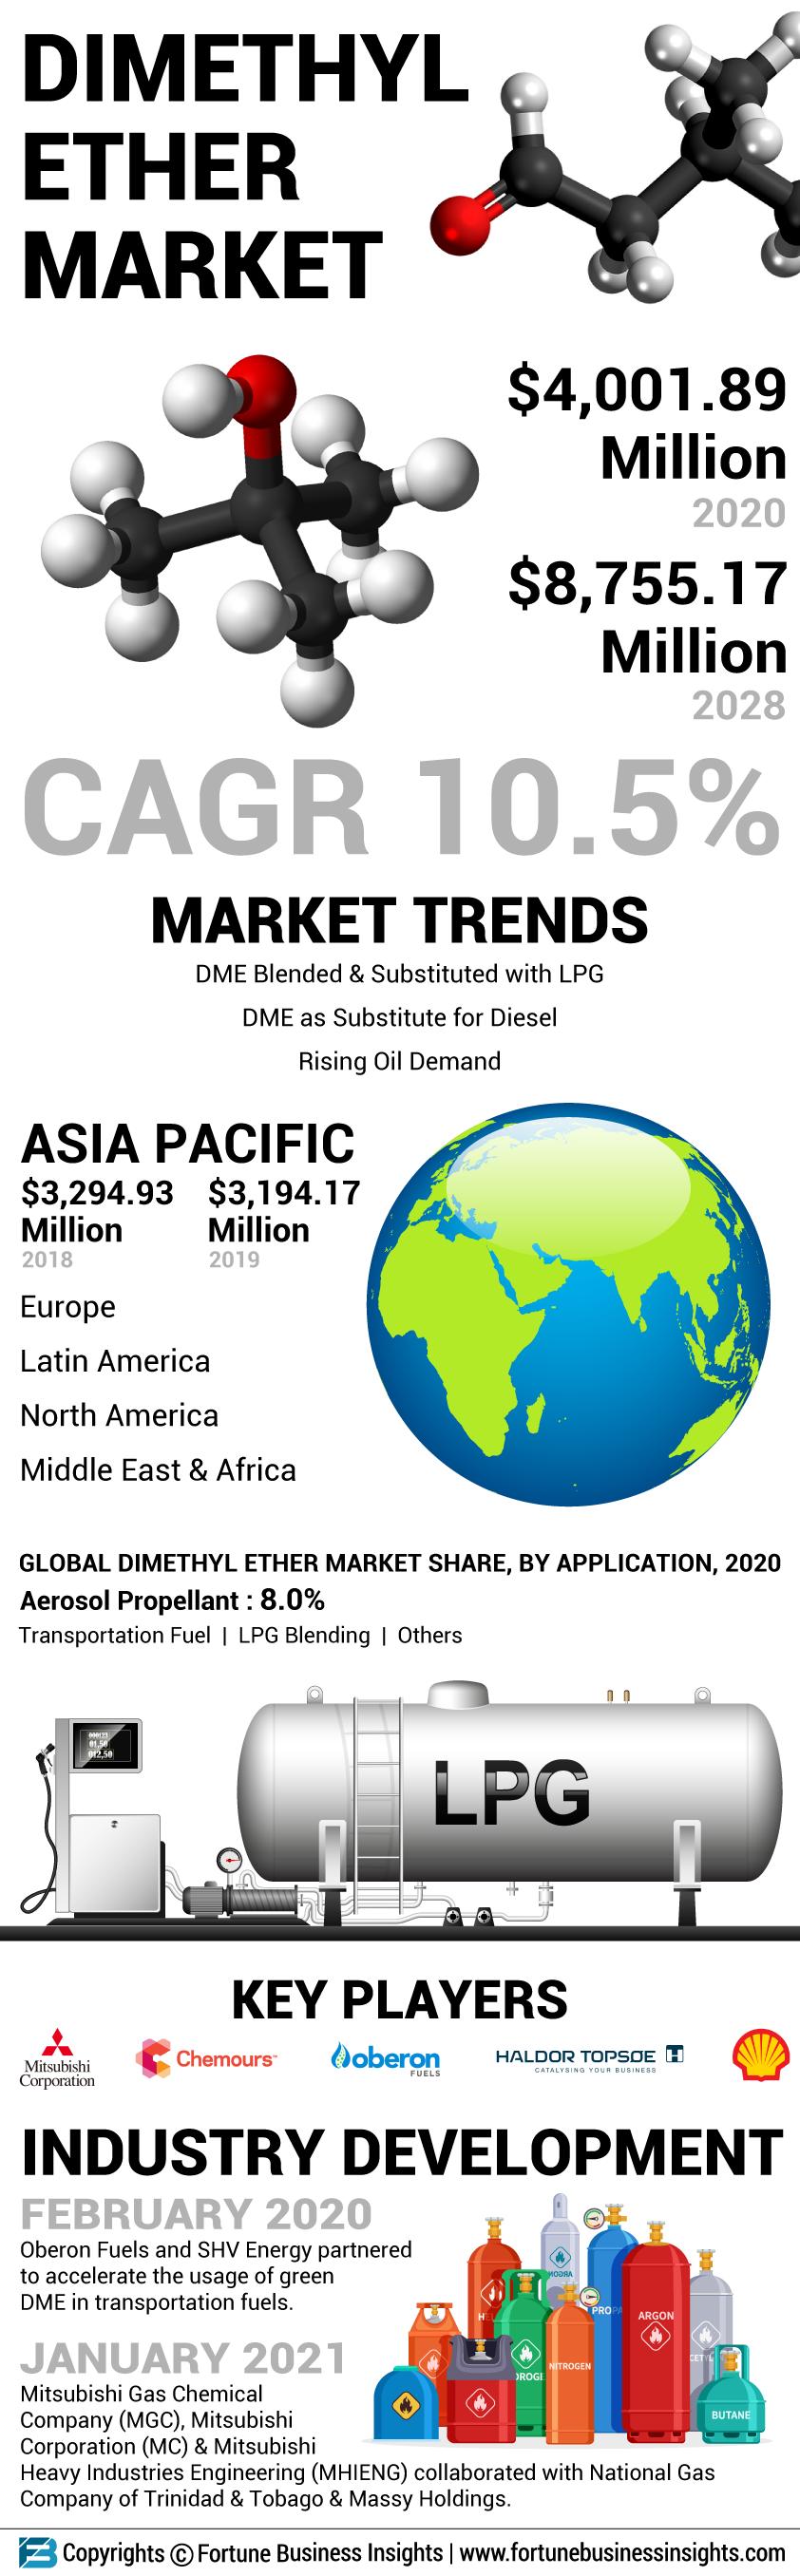 Dimethyl Ether Market